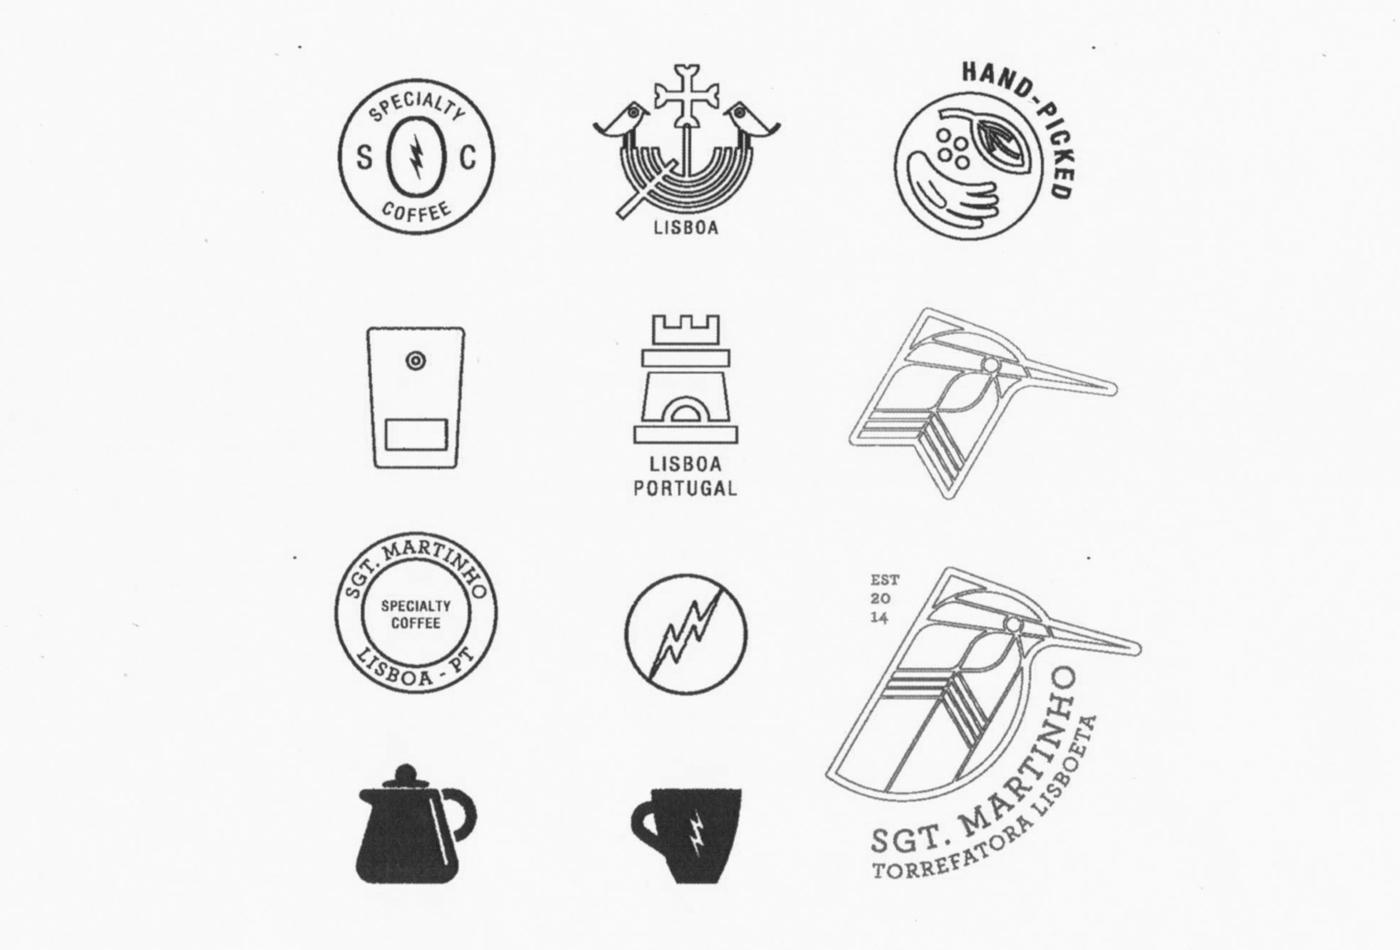 08-sargento-sergeant-martinho-coffee-brand-marks-logo-vacaliebres